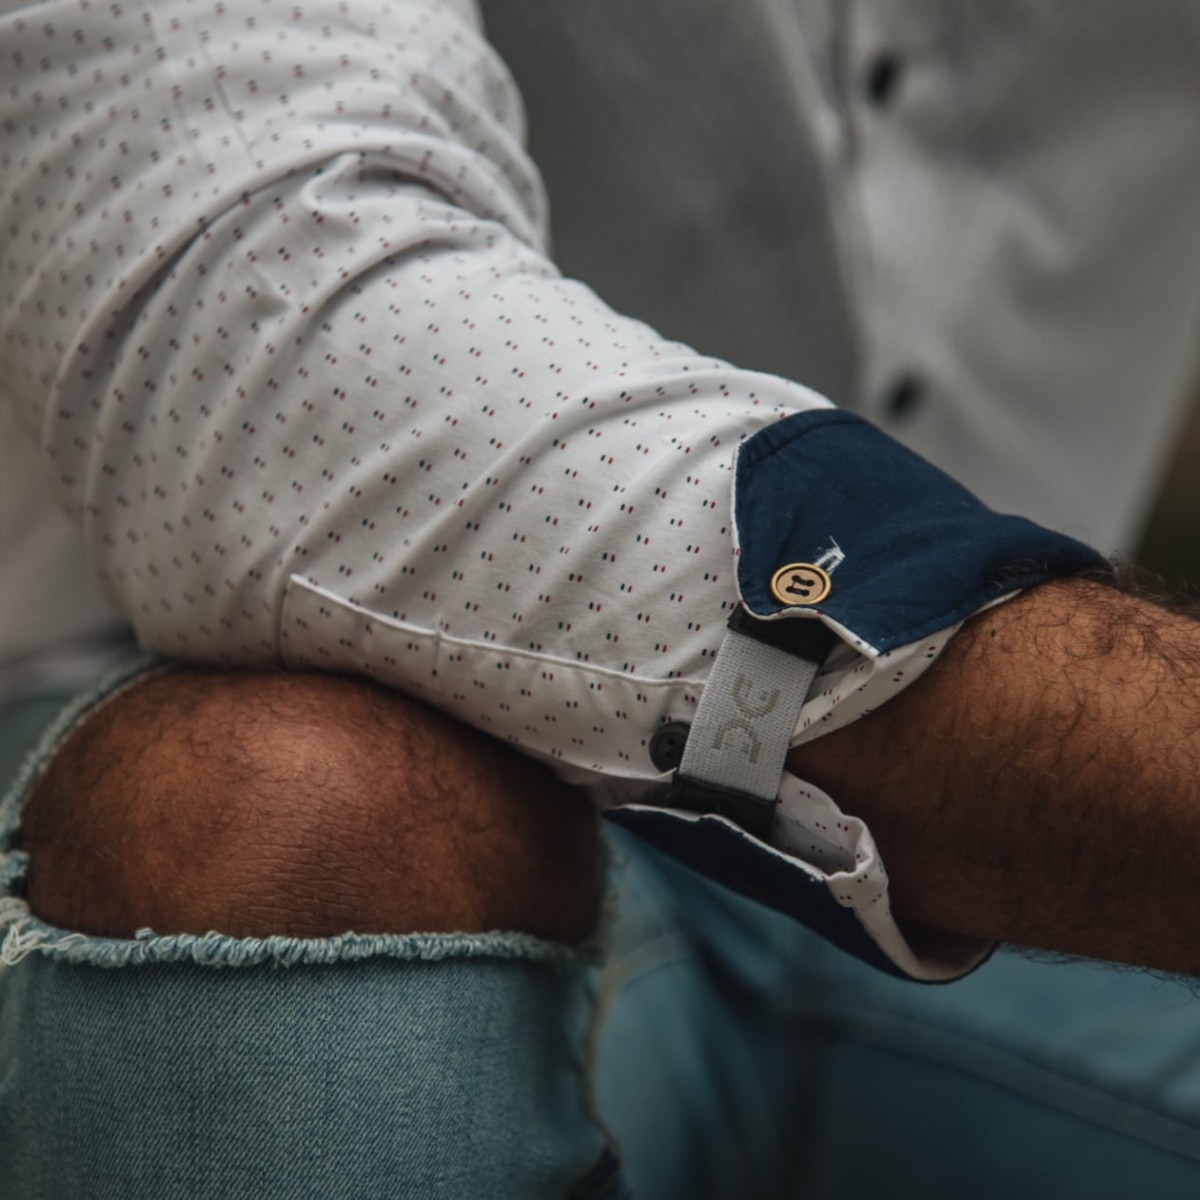 FLXCUF Clear-Cut Pack Cuff Holders keep you looking fresh